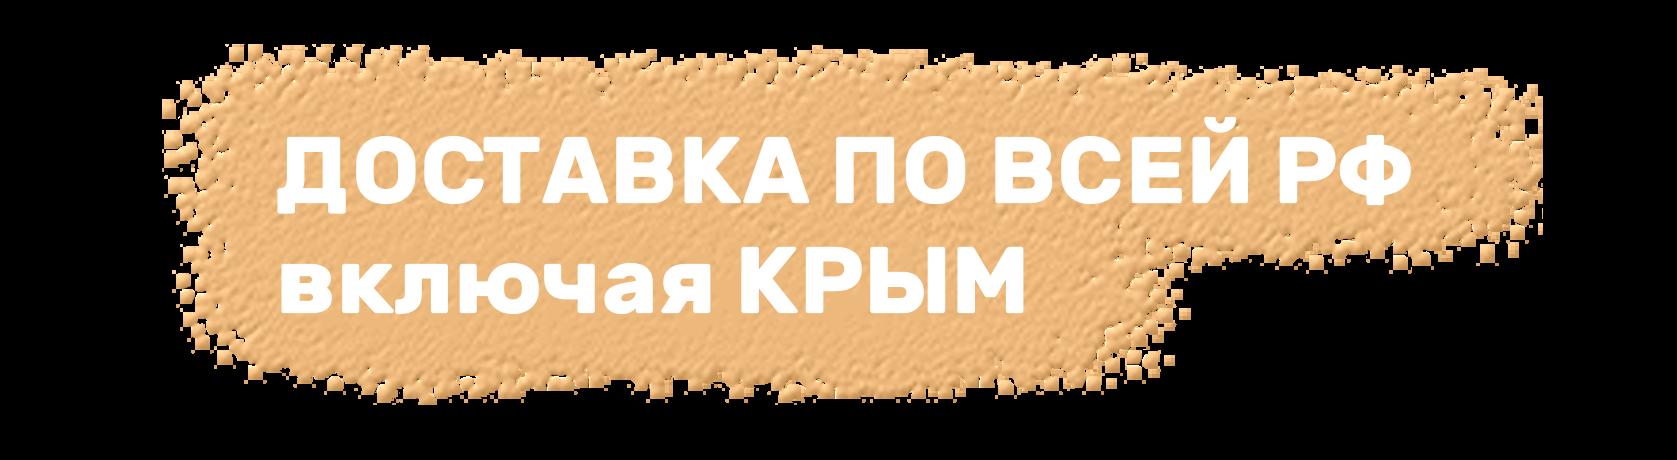 Доставка Pir плит (пир плит) по всей территории РФ